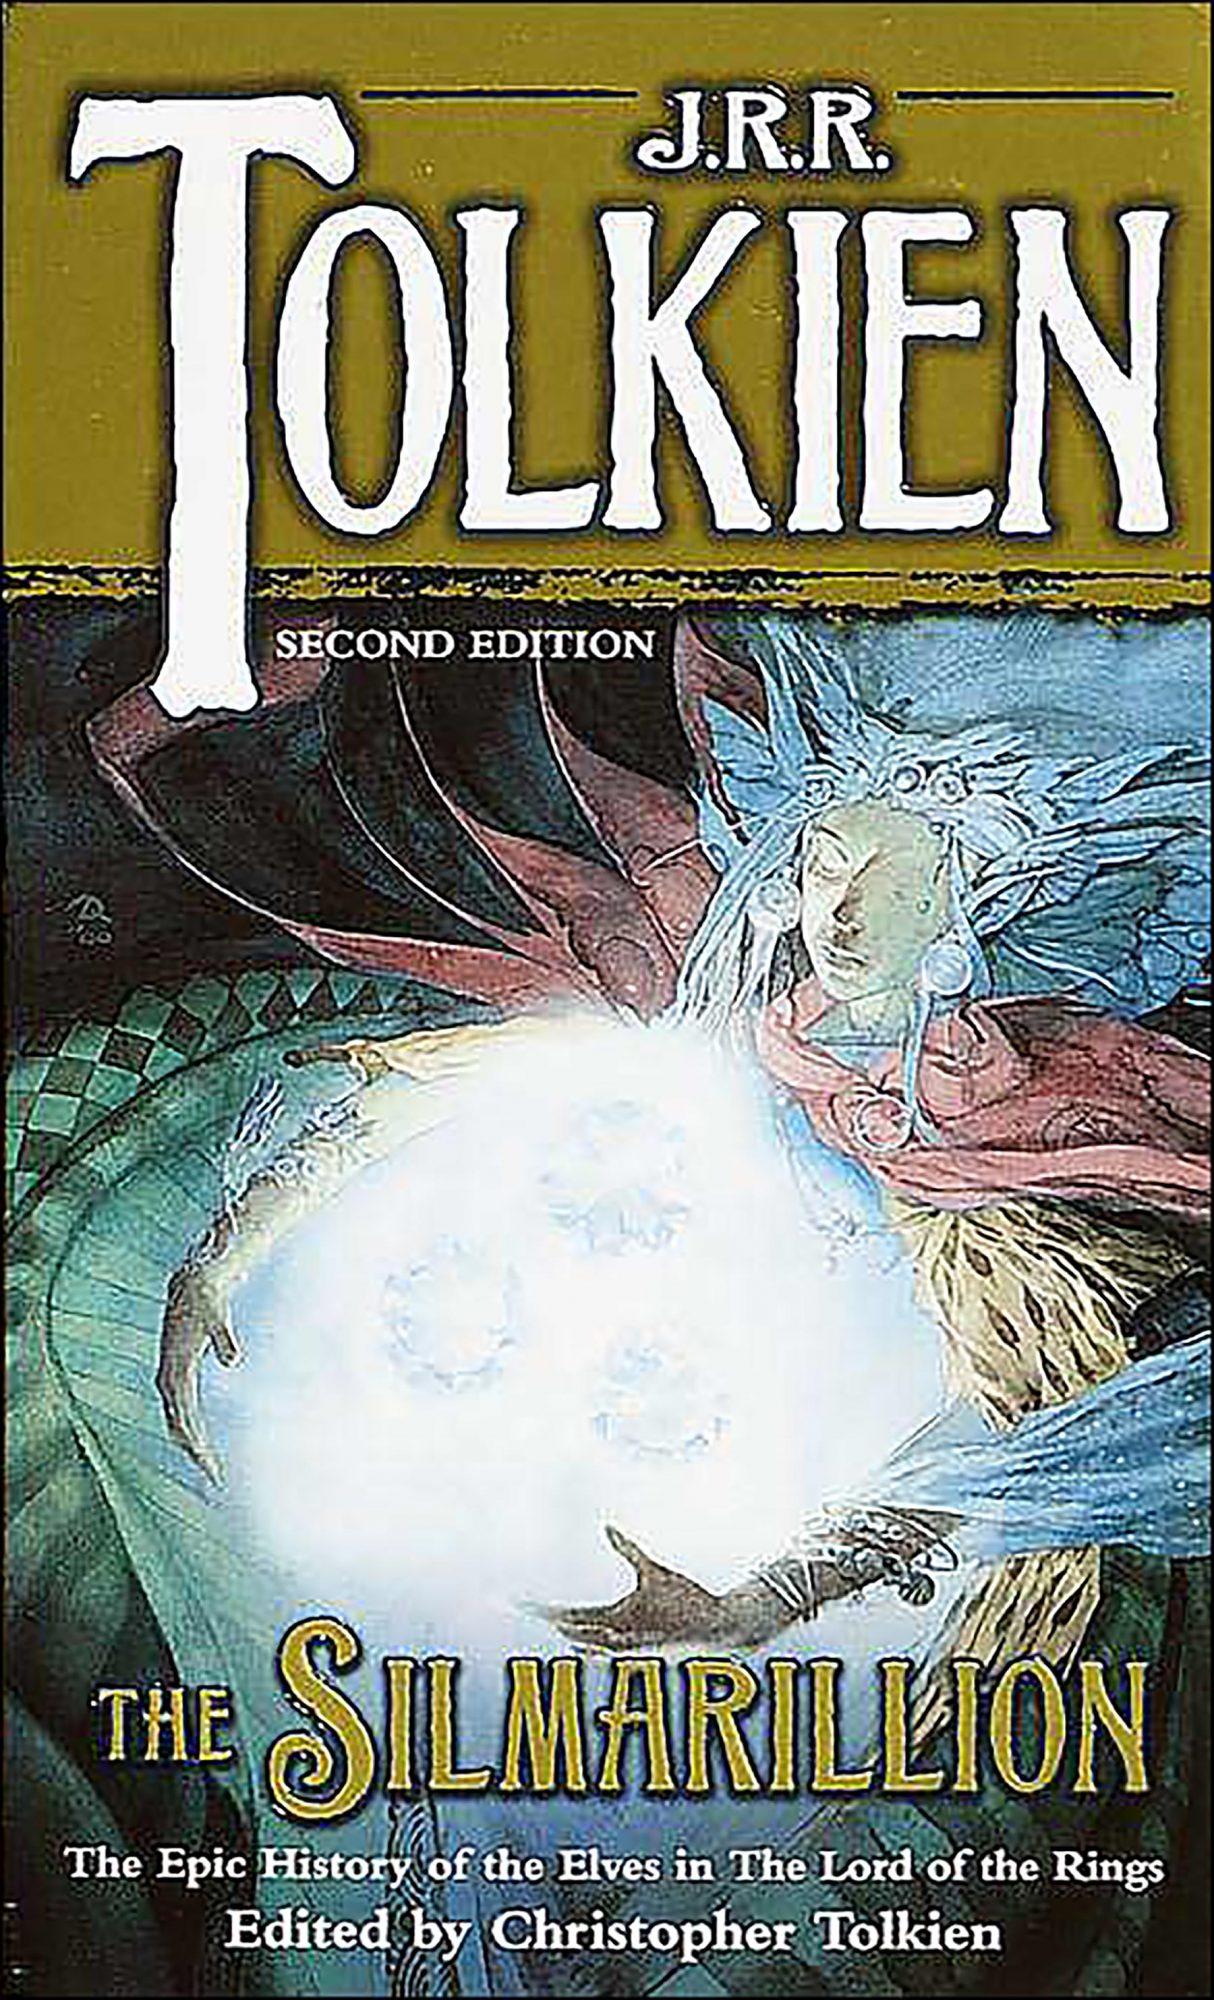 J.R.R. Tolkien, The Silmarillion